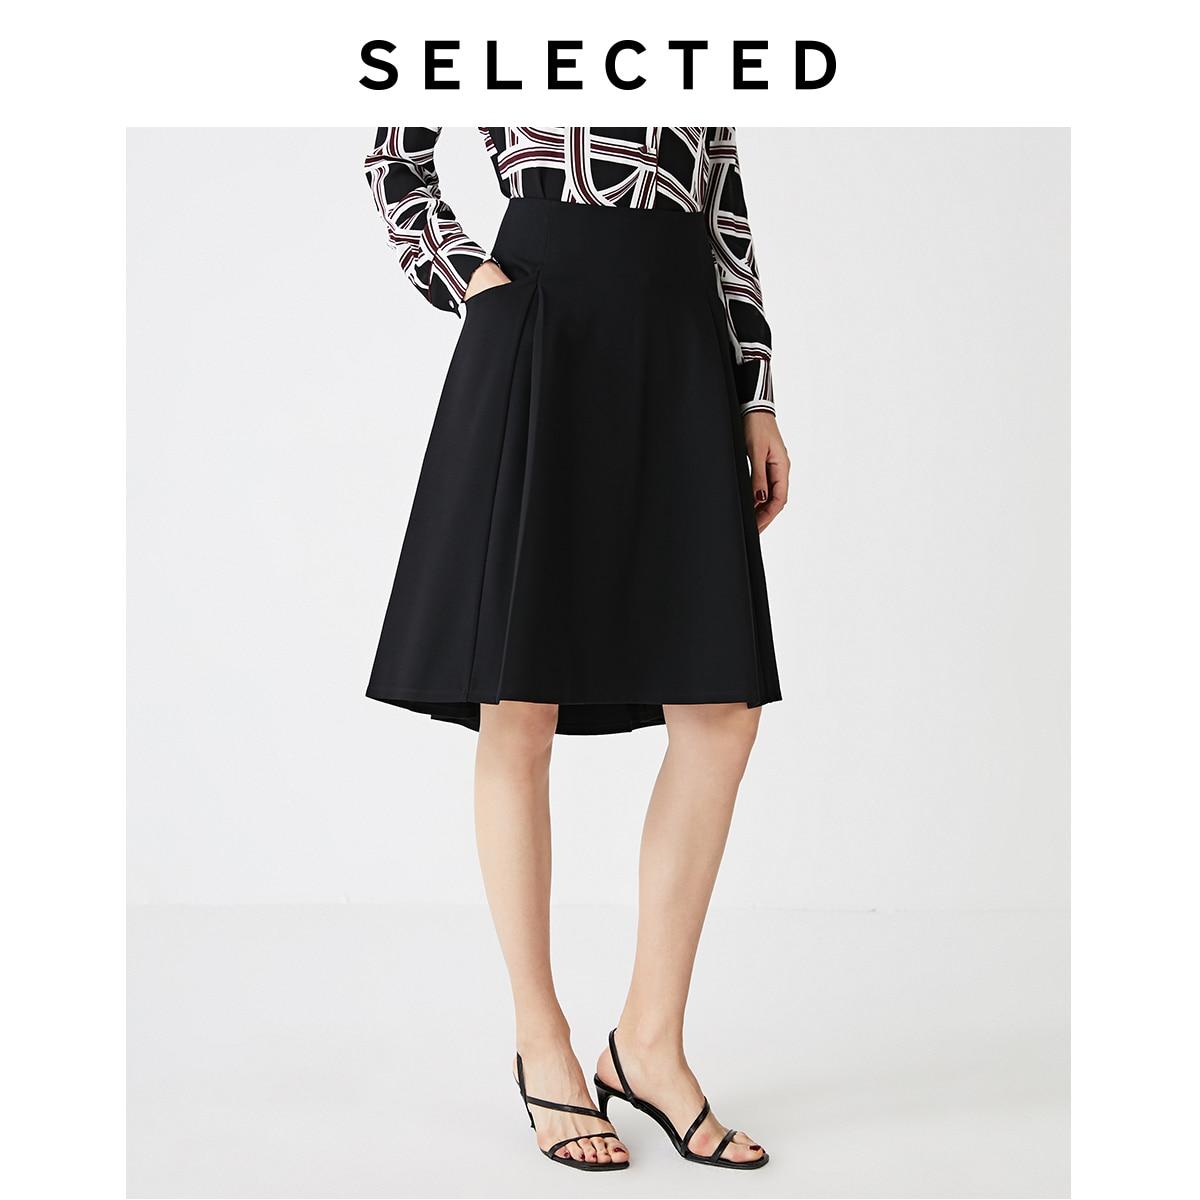 SELECTED Women's Black Stretch Umbrella Knit Skirt S|41931G502